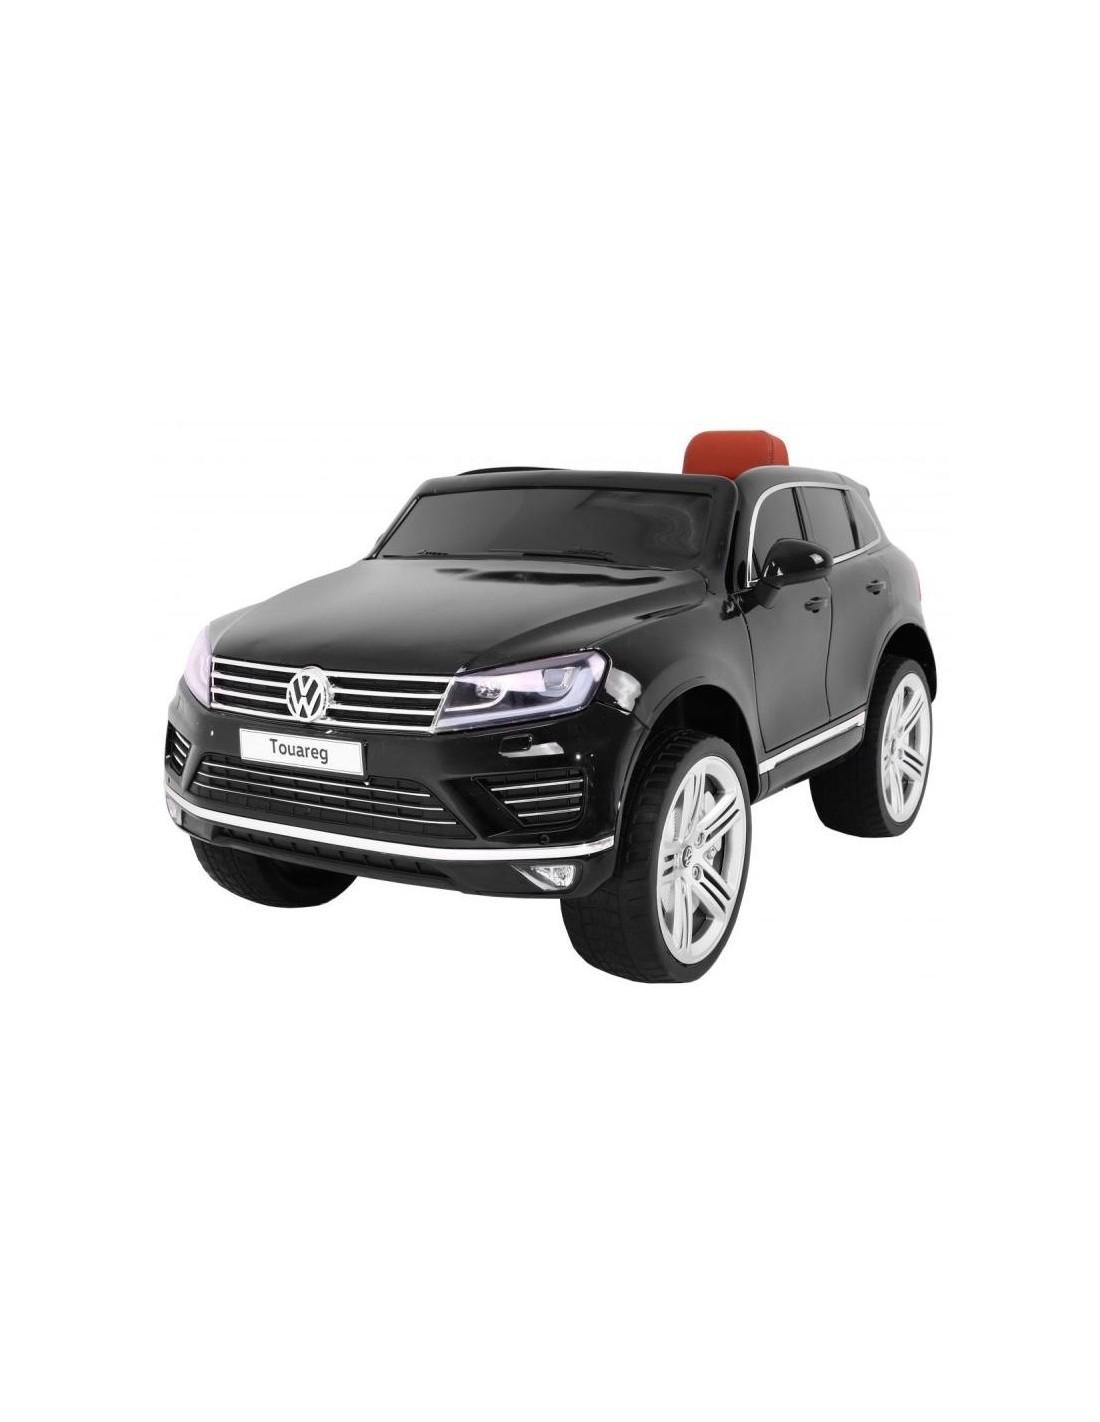 4c6e0d559 Coche eléctrico infantil Volkswagen Touareg - Con pantalla TÁCTIL MP4